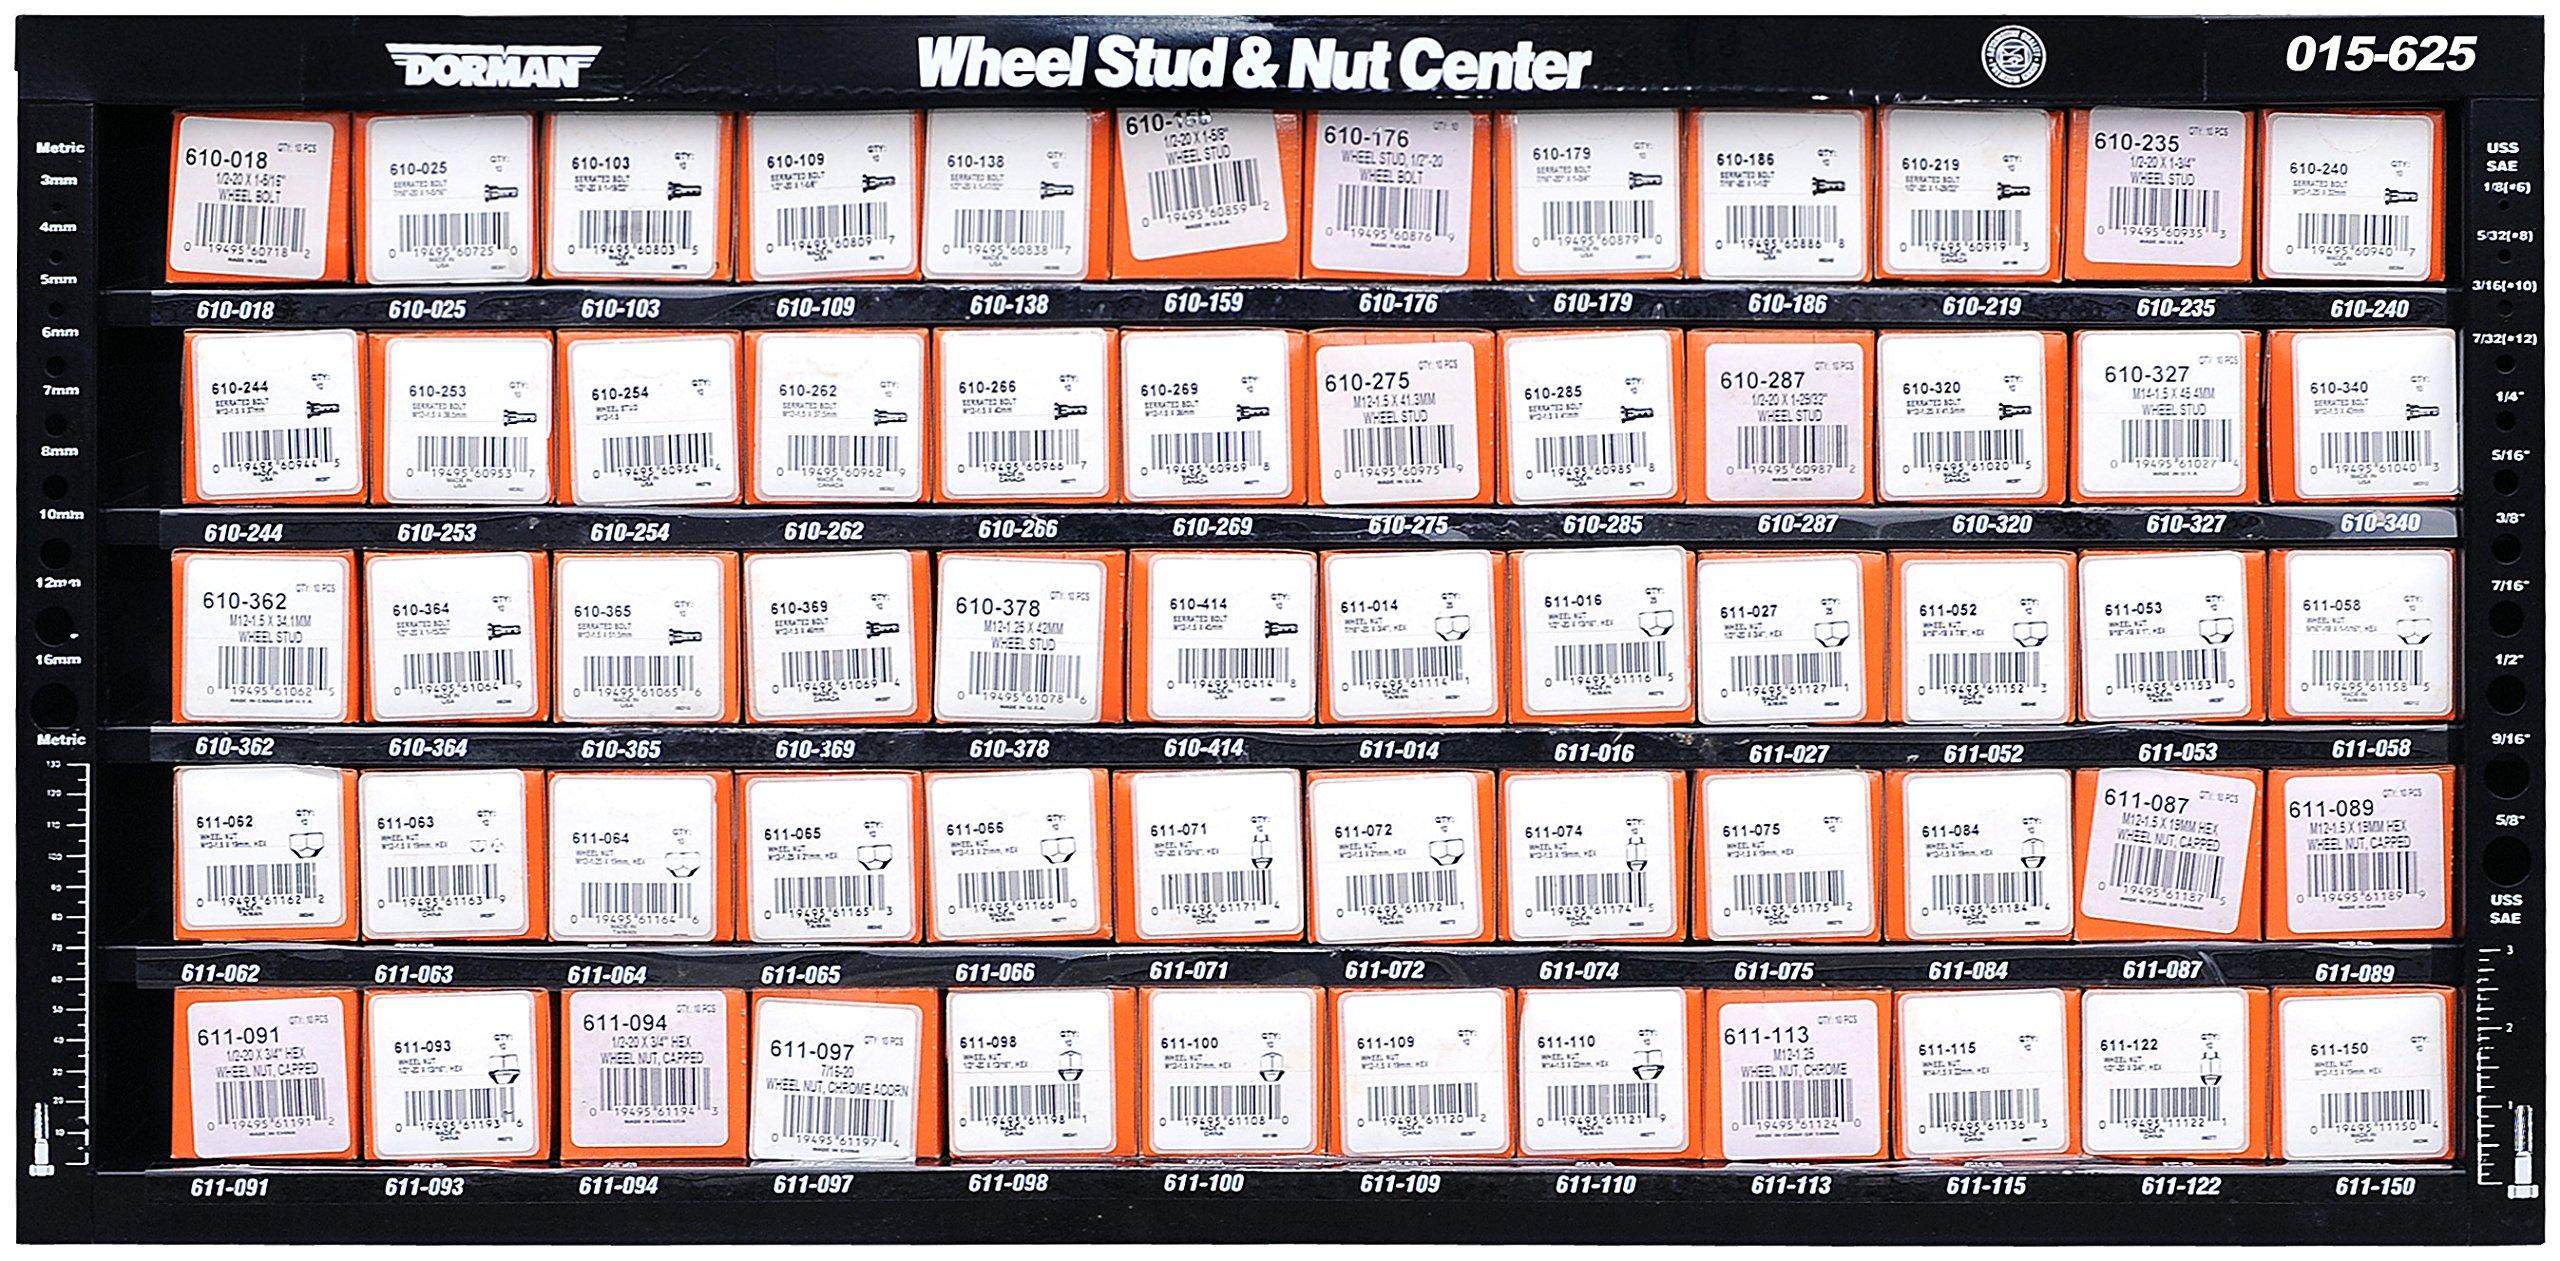 Dorman 015-625 Wheel Hardware Wheel Nut Wall Mount Assortment